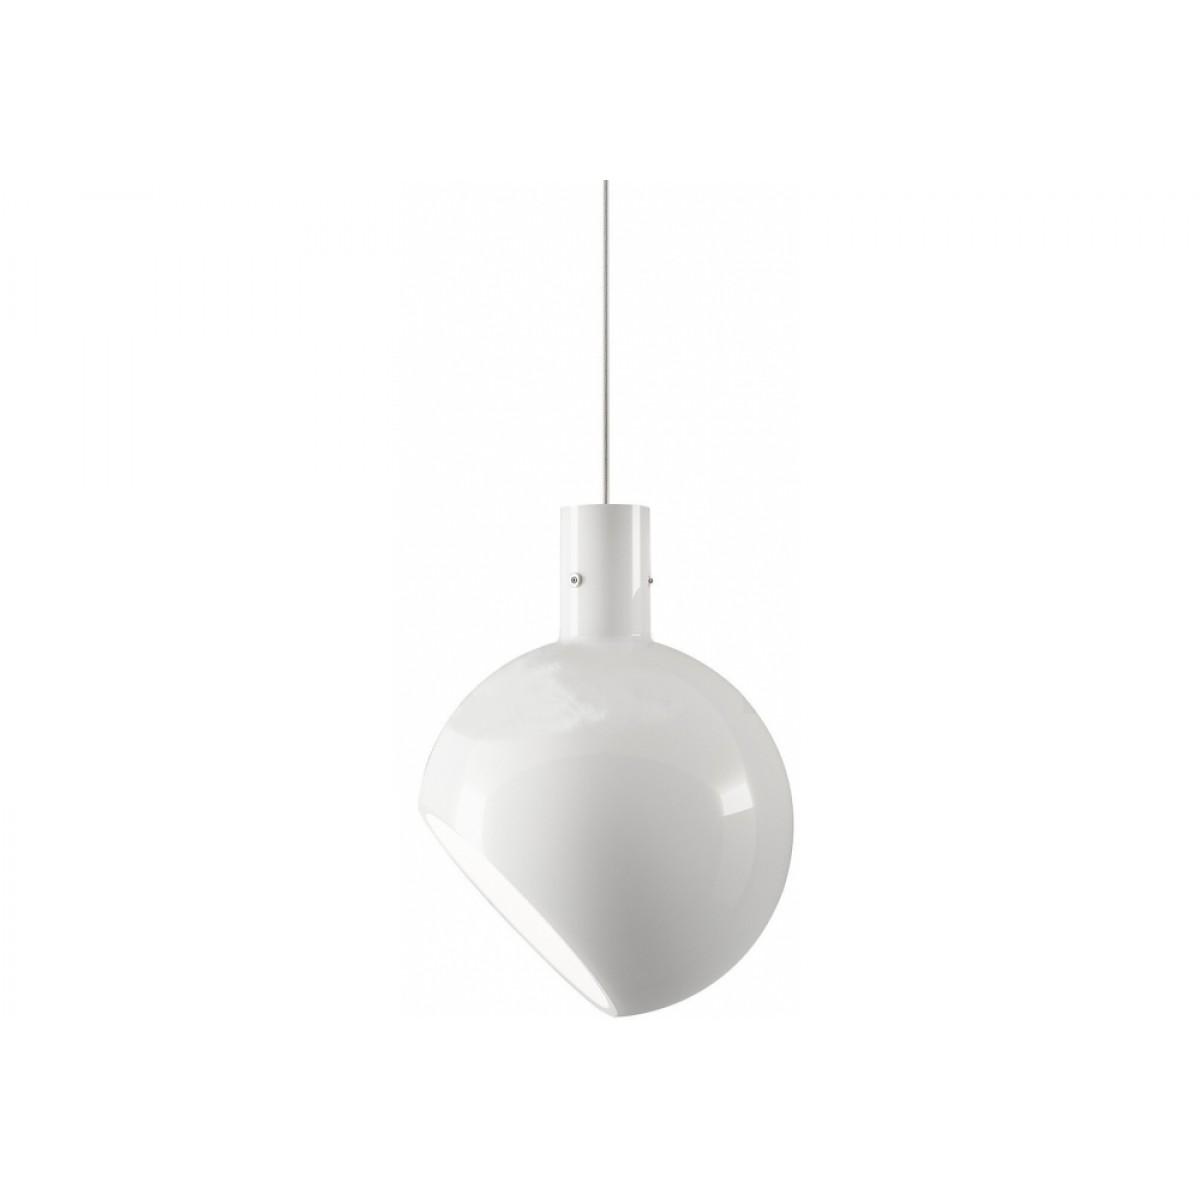 Emejing Outlet Della Lampada Ideas - Idee Arredamento Casa - baoliao.us